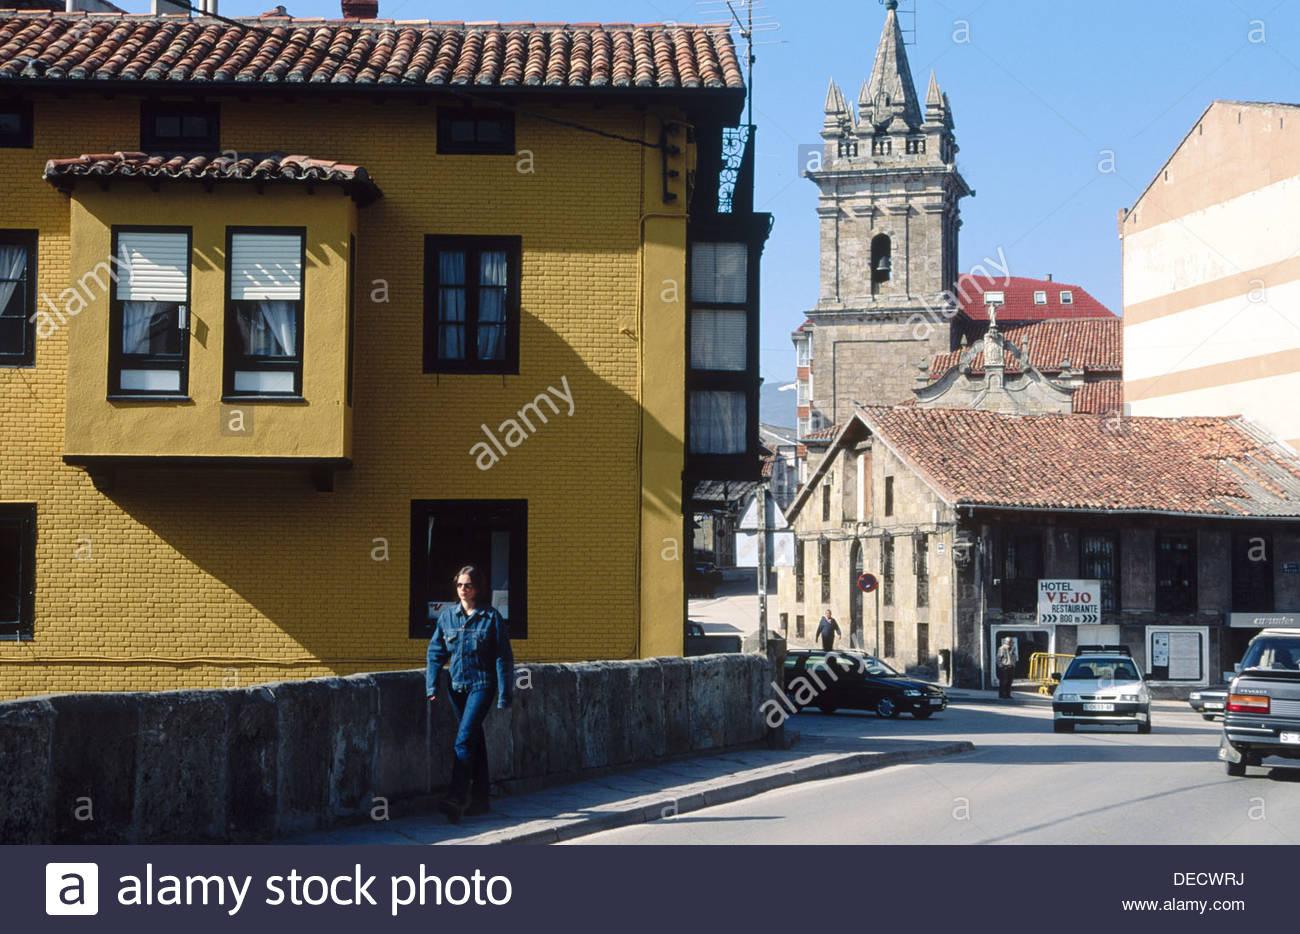 San Sebastian church XVI XVIIIth centuries in background 1300x934